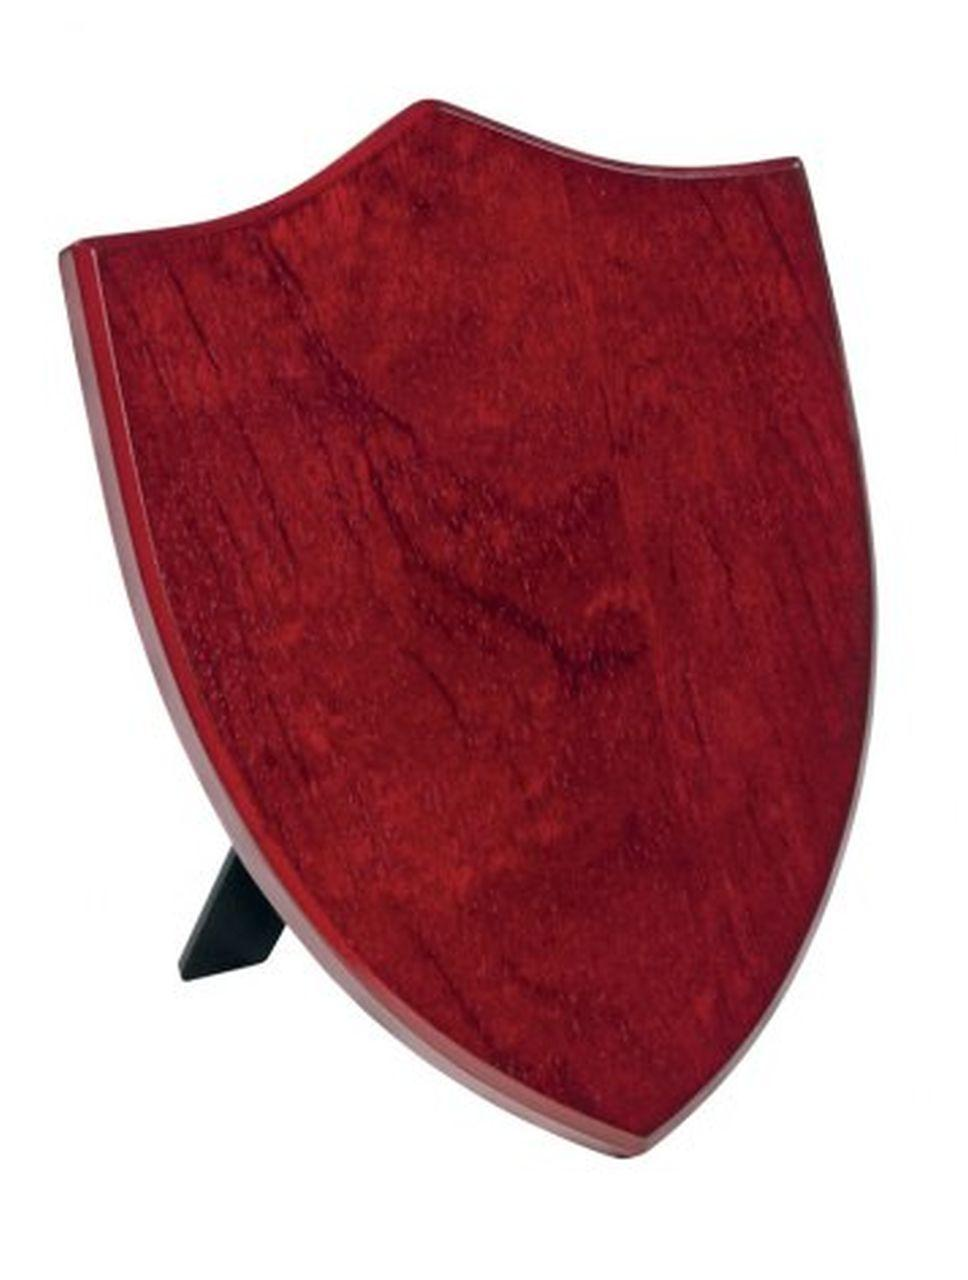 Crest scudo legno MDF mogano